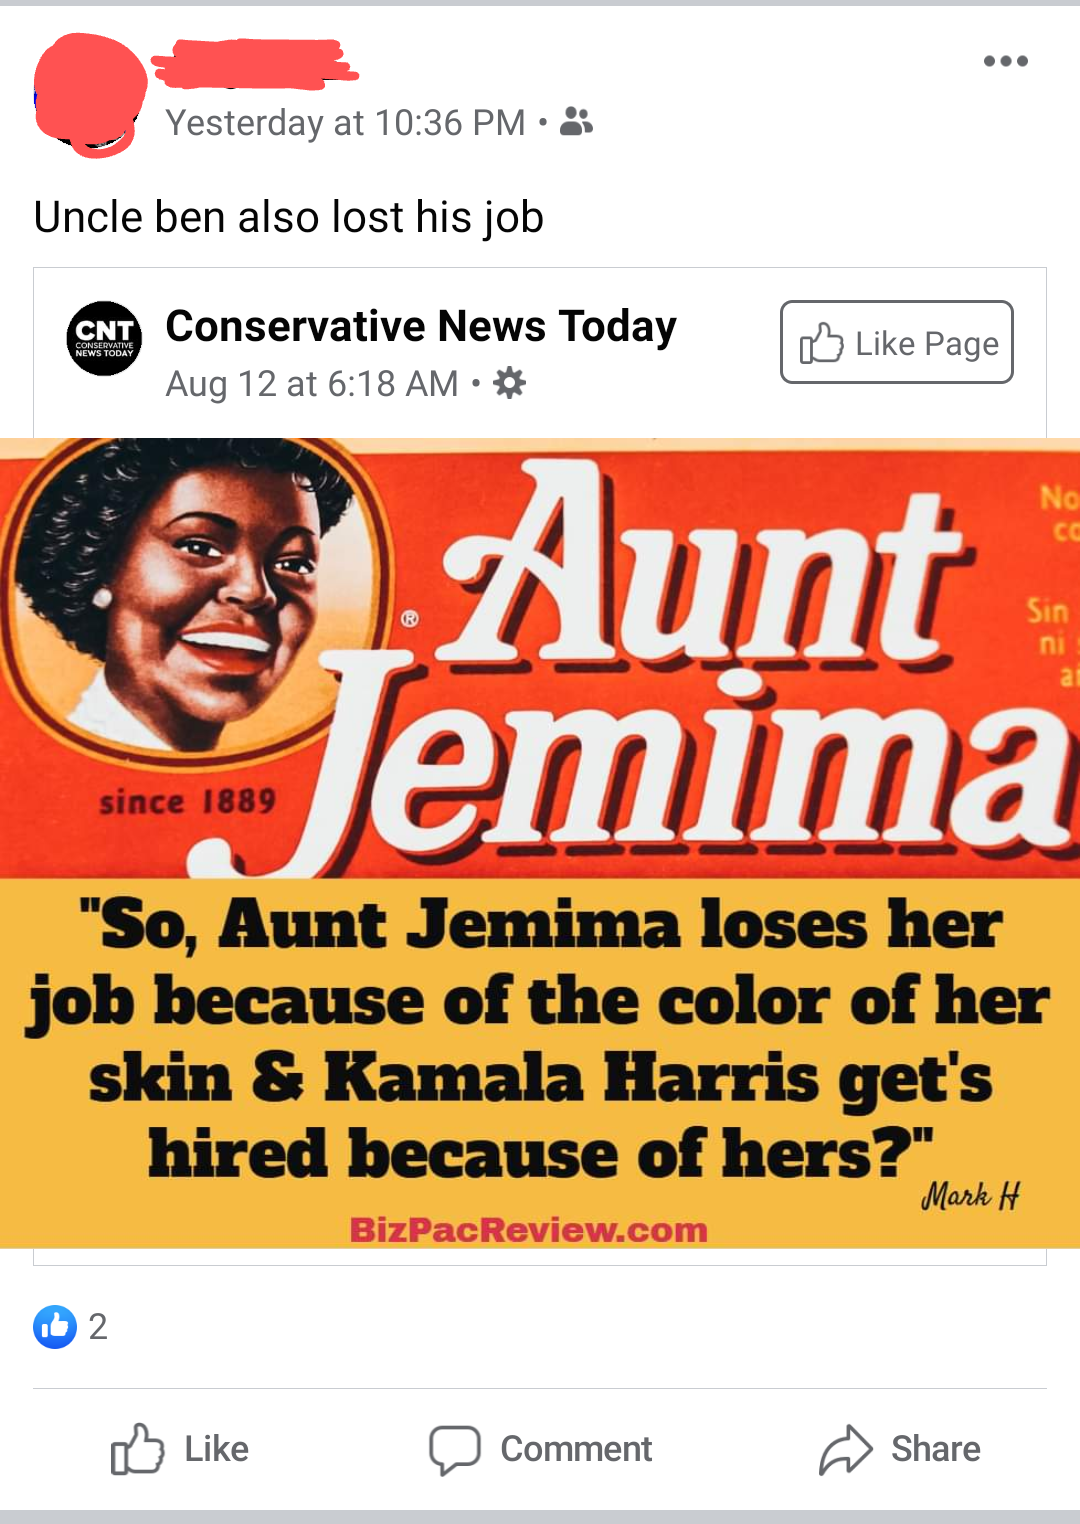 Aunt Jemima Loses Her Job